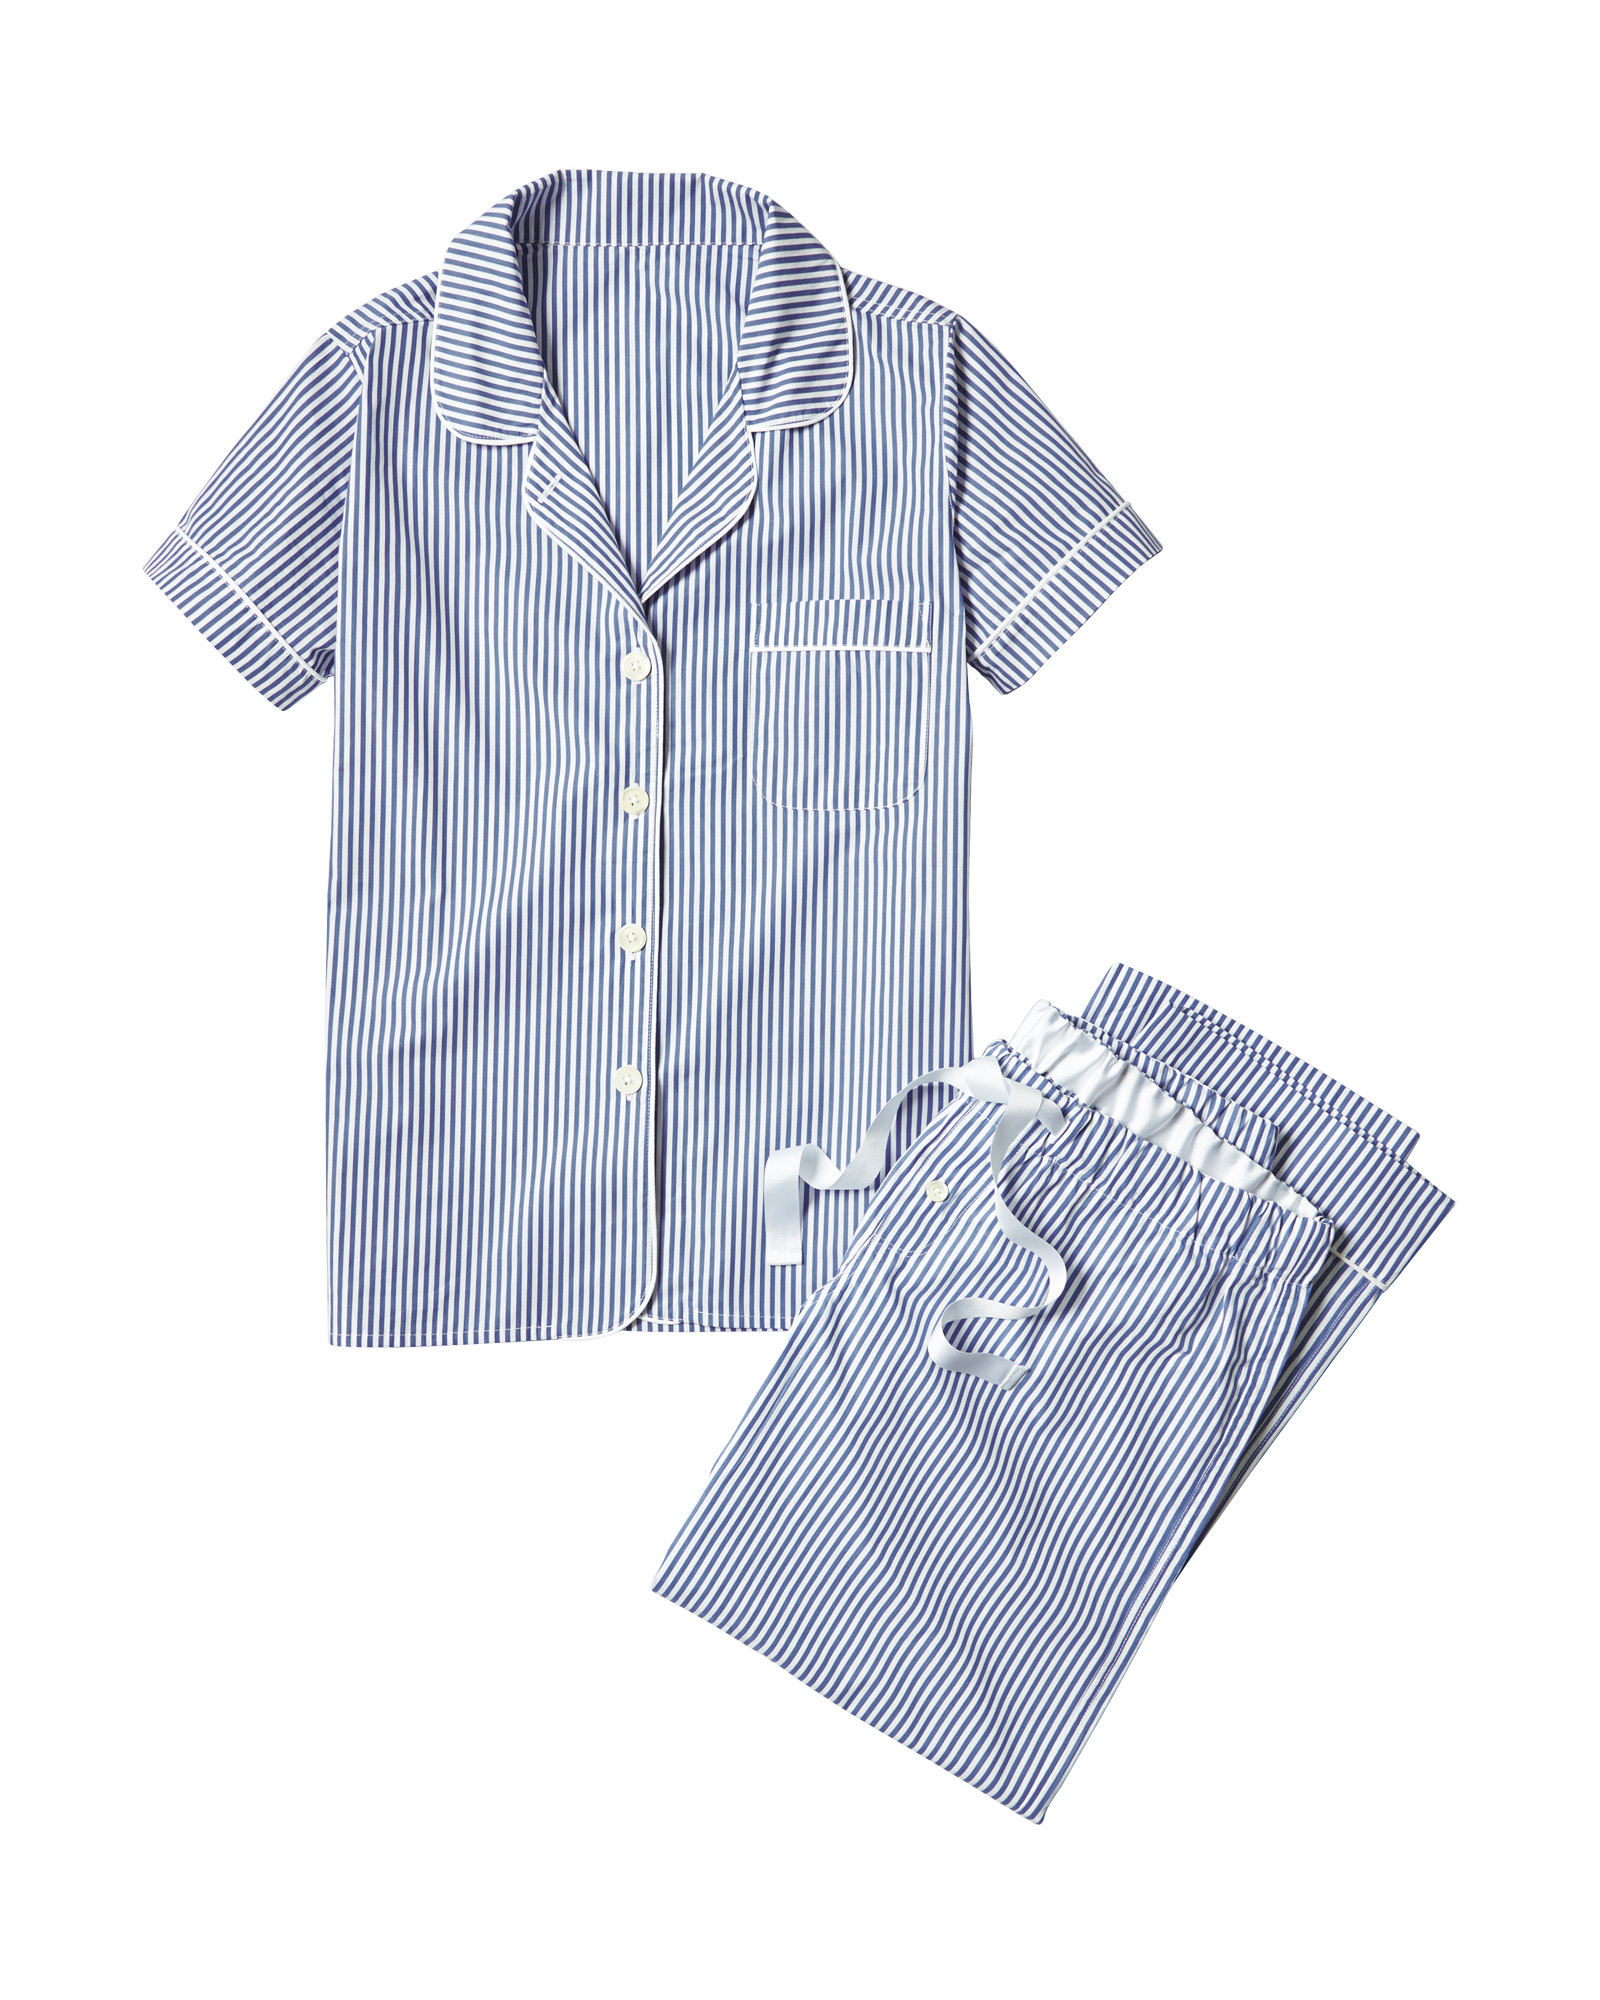 Pajama_Oxford_Stripe_Blue_Alt_MV_Crop_OL.jpg